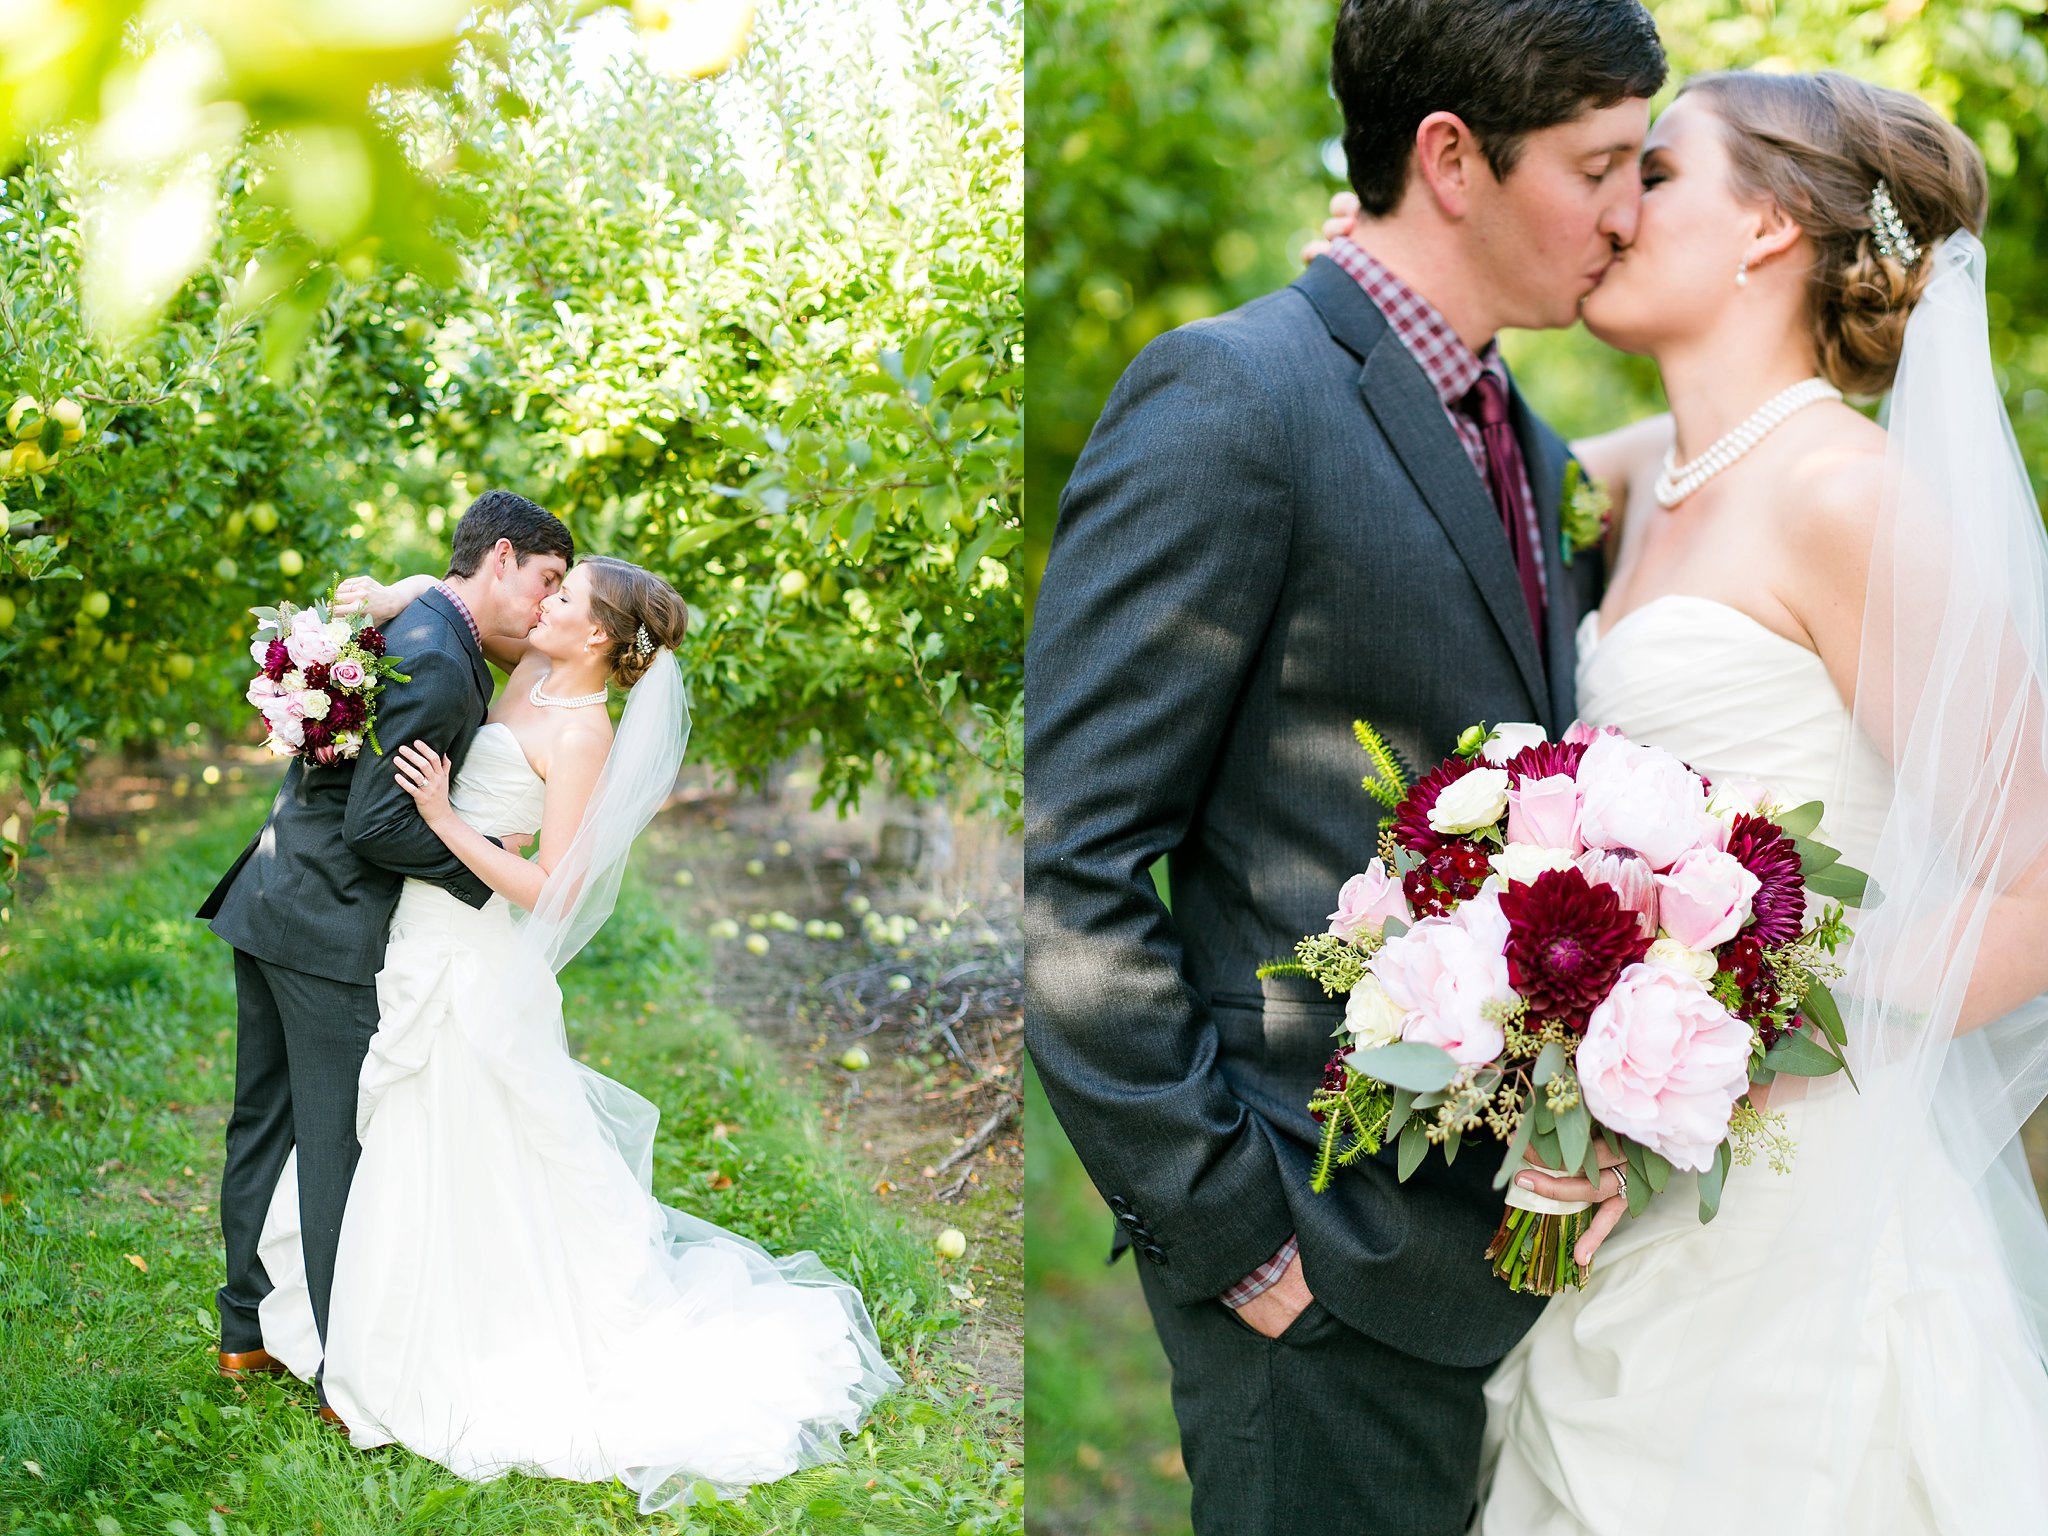 Chelan Washington Wedding Photos Megan Kelsey Photography Delight Wedding Workshop Styled Shoot Annalee & Scot-106.jpg